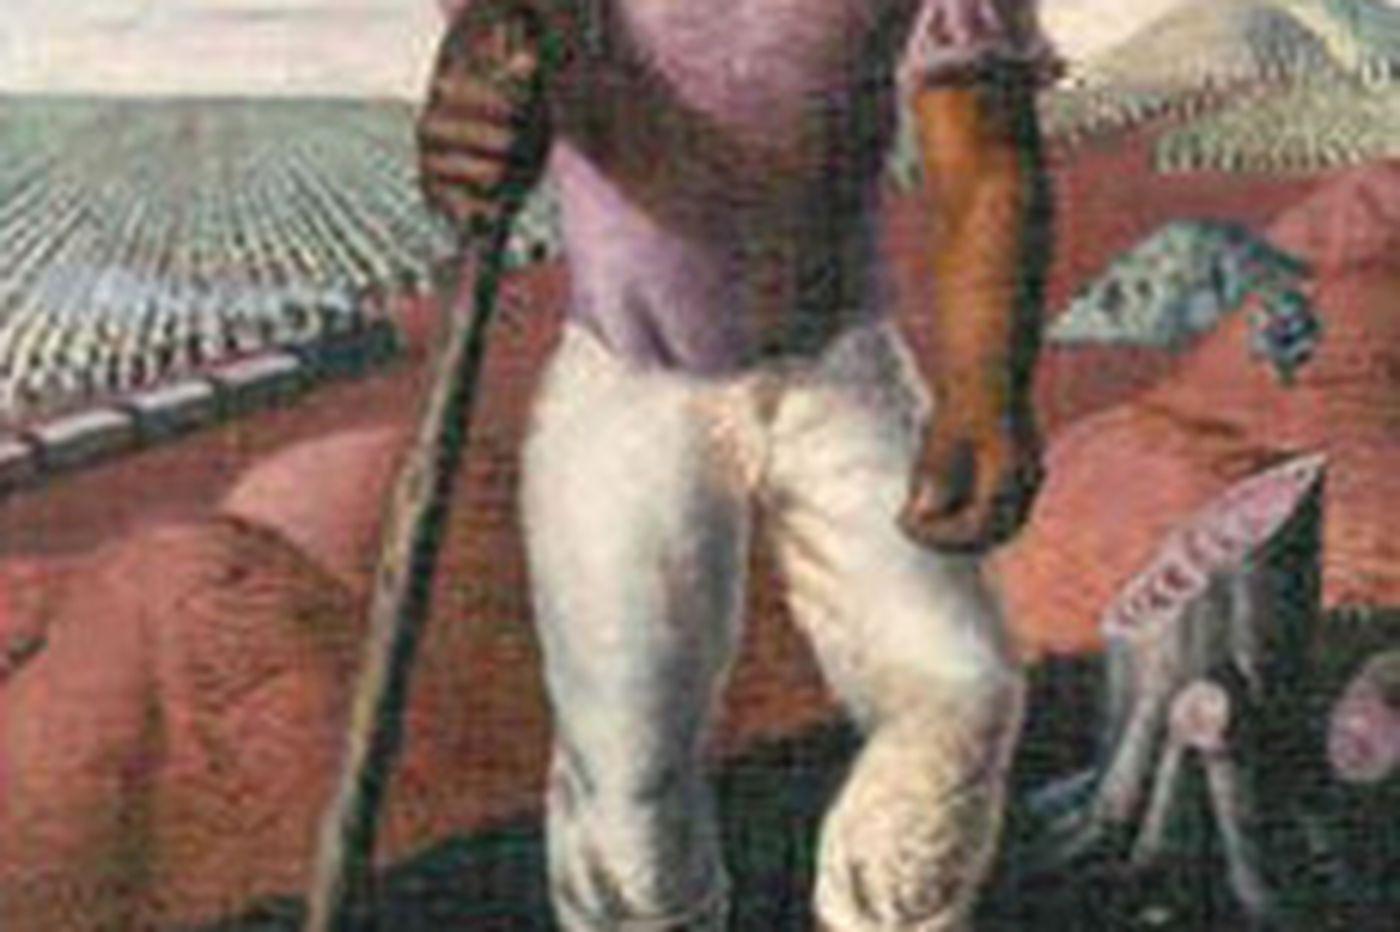 Masterpieces stolen from Brazil museum